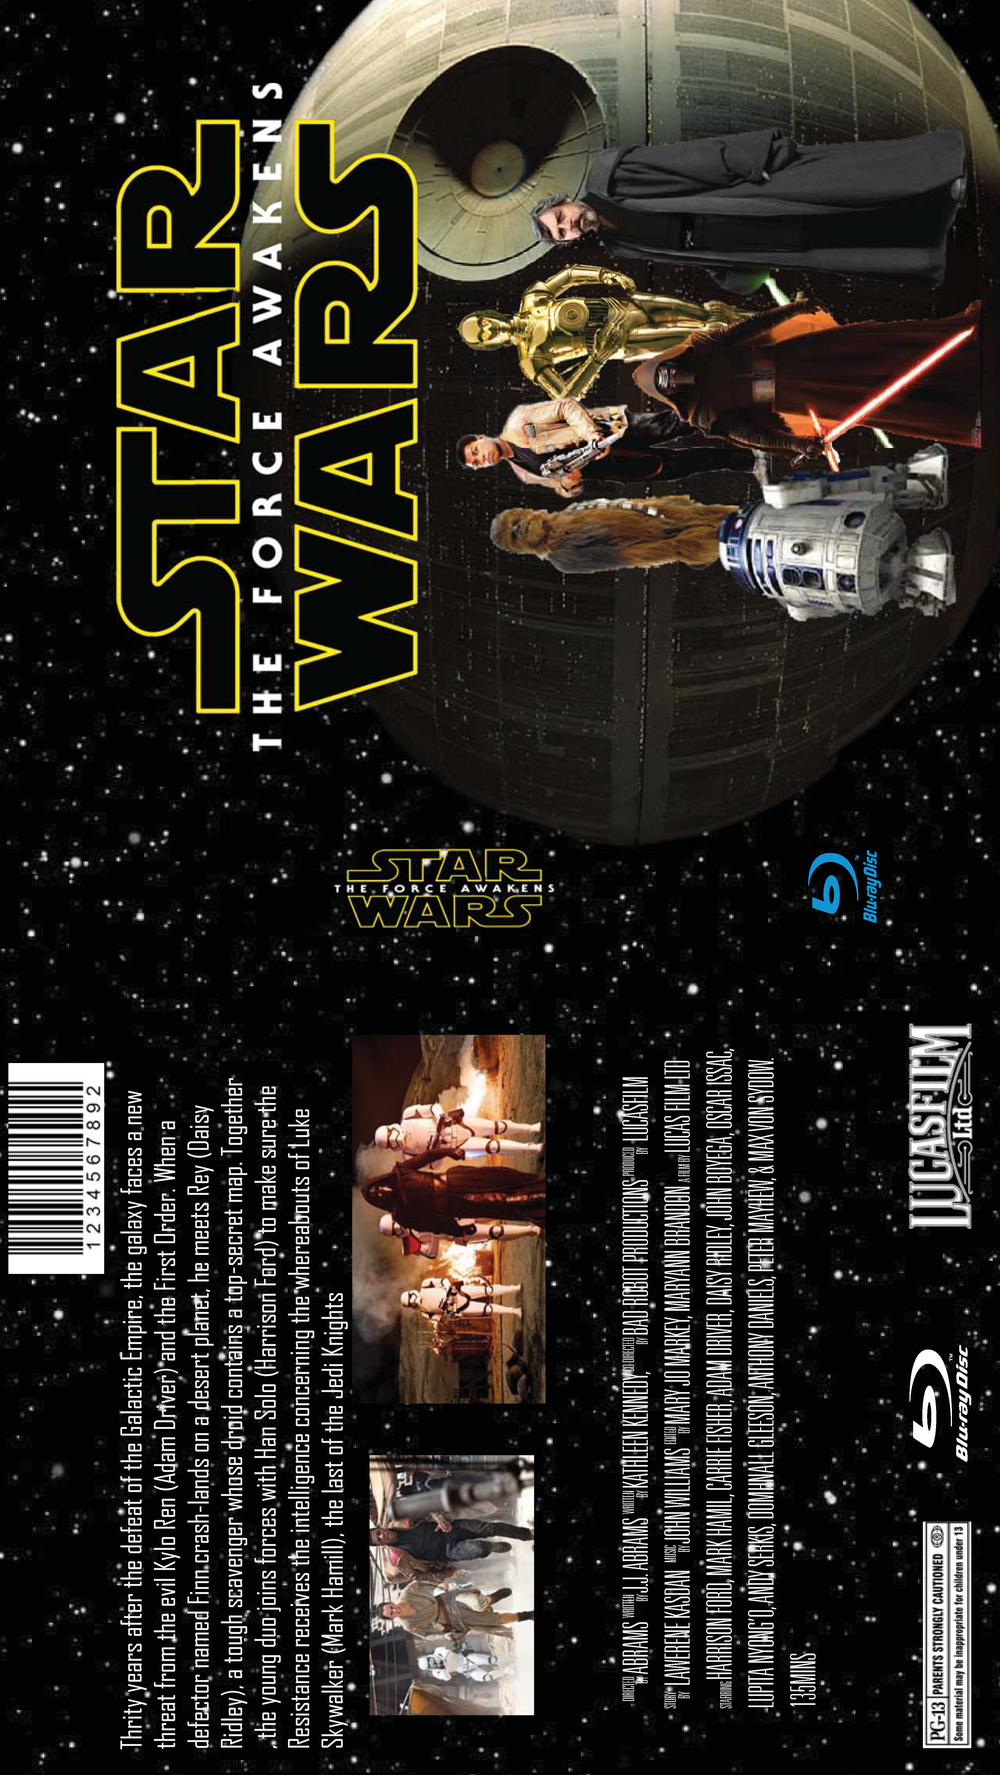 Star Wars Episode 7-Wenning 3.png